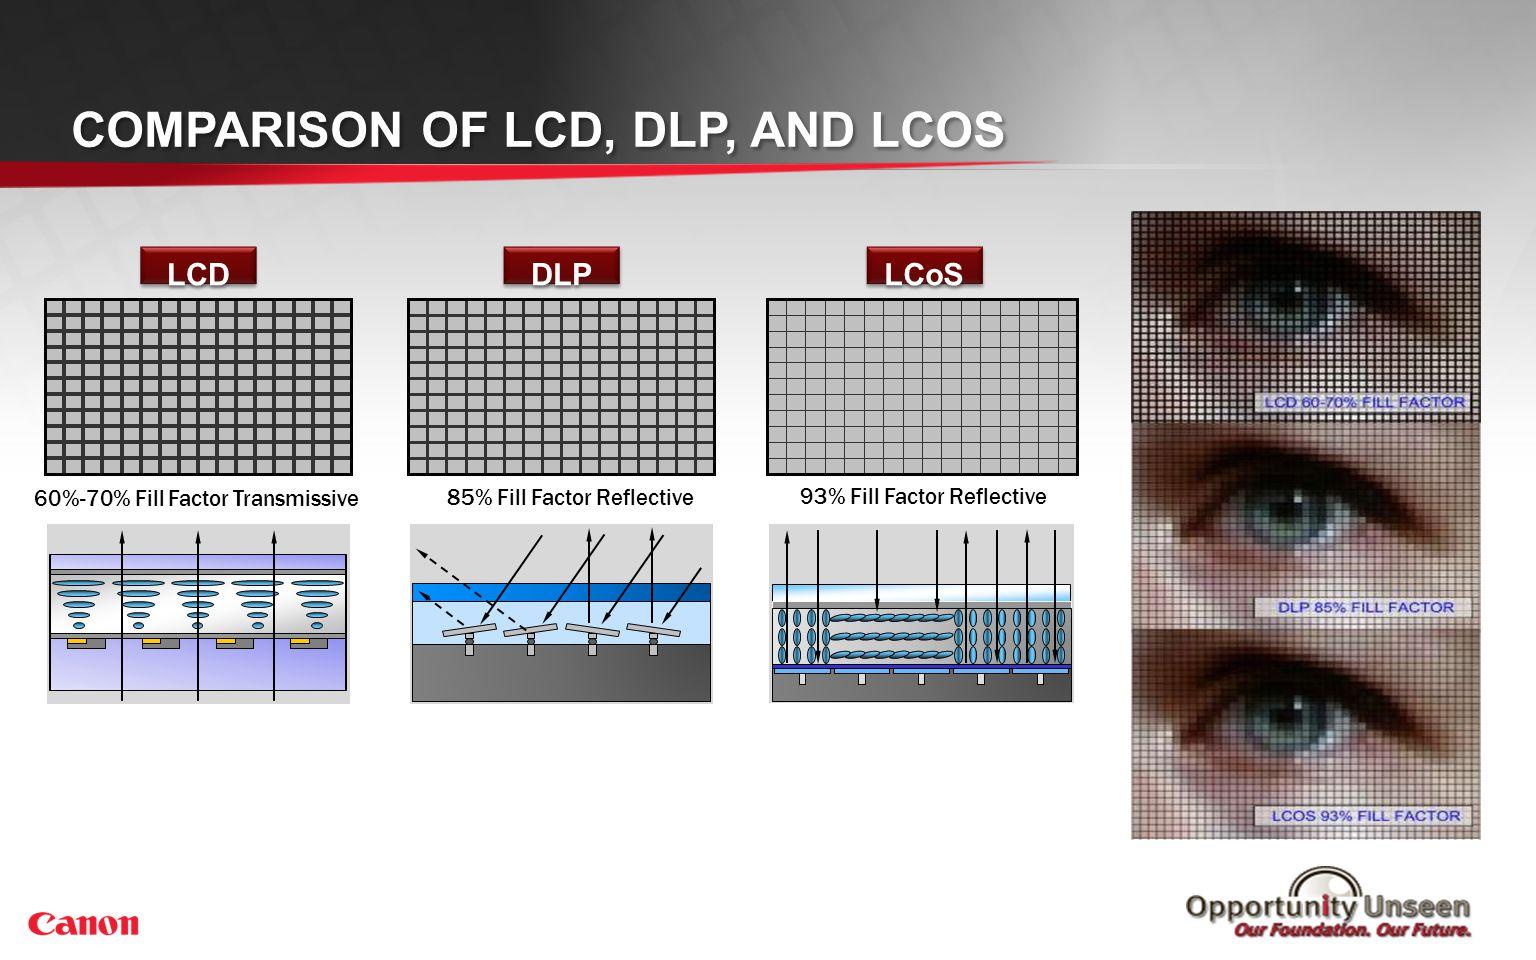 Canon-LCOS-Advantages-High-Fill-Factor.jpg